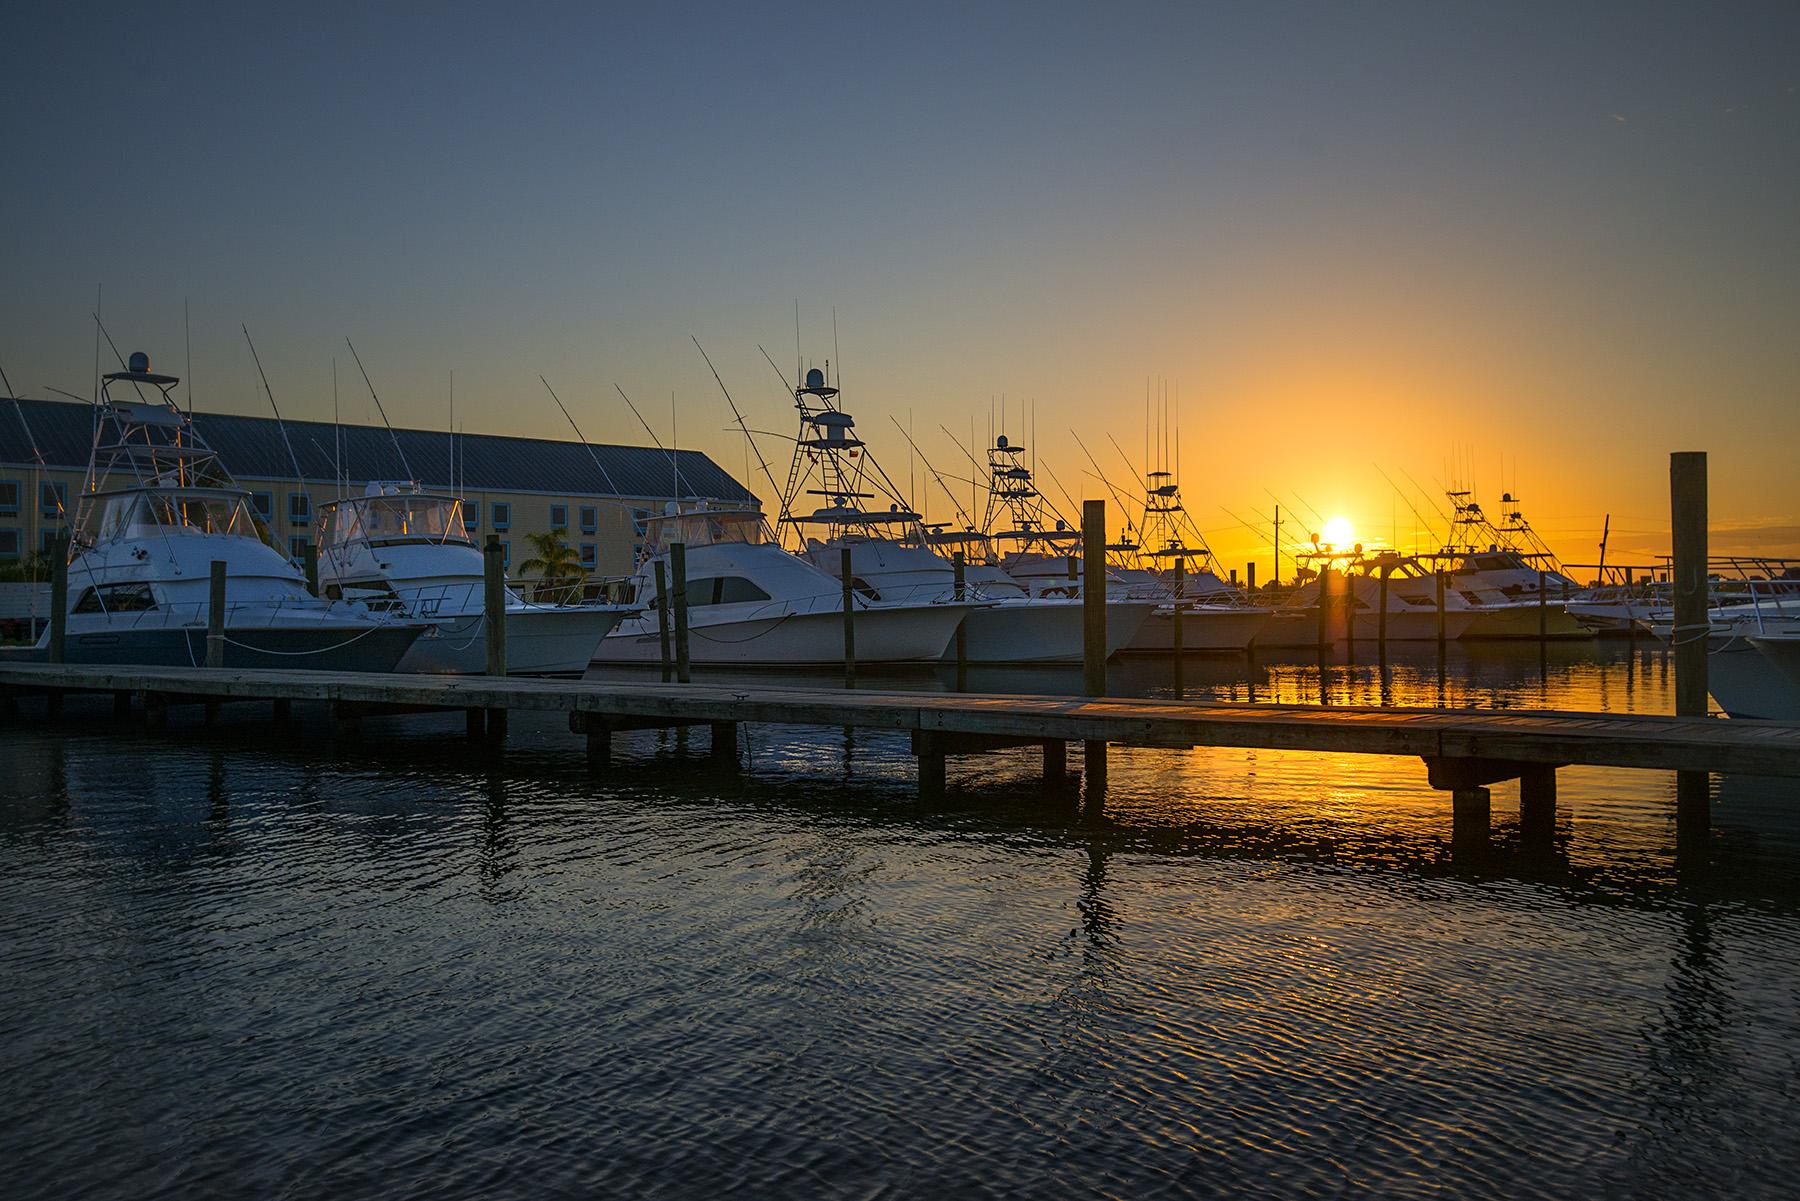 sunrise at the marina. nikon d800, 35mm, f/ 4.0, 1/2500 sec